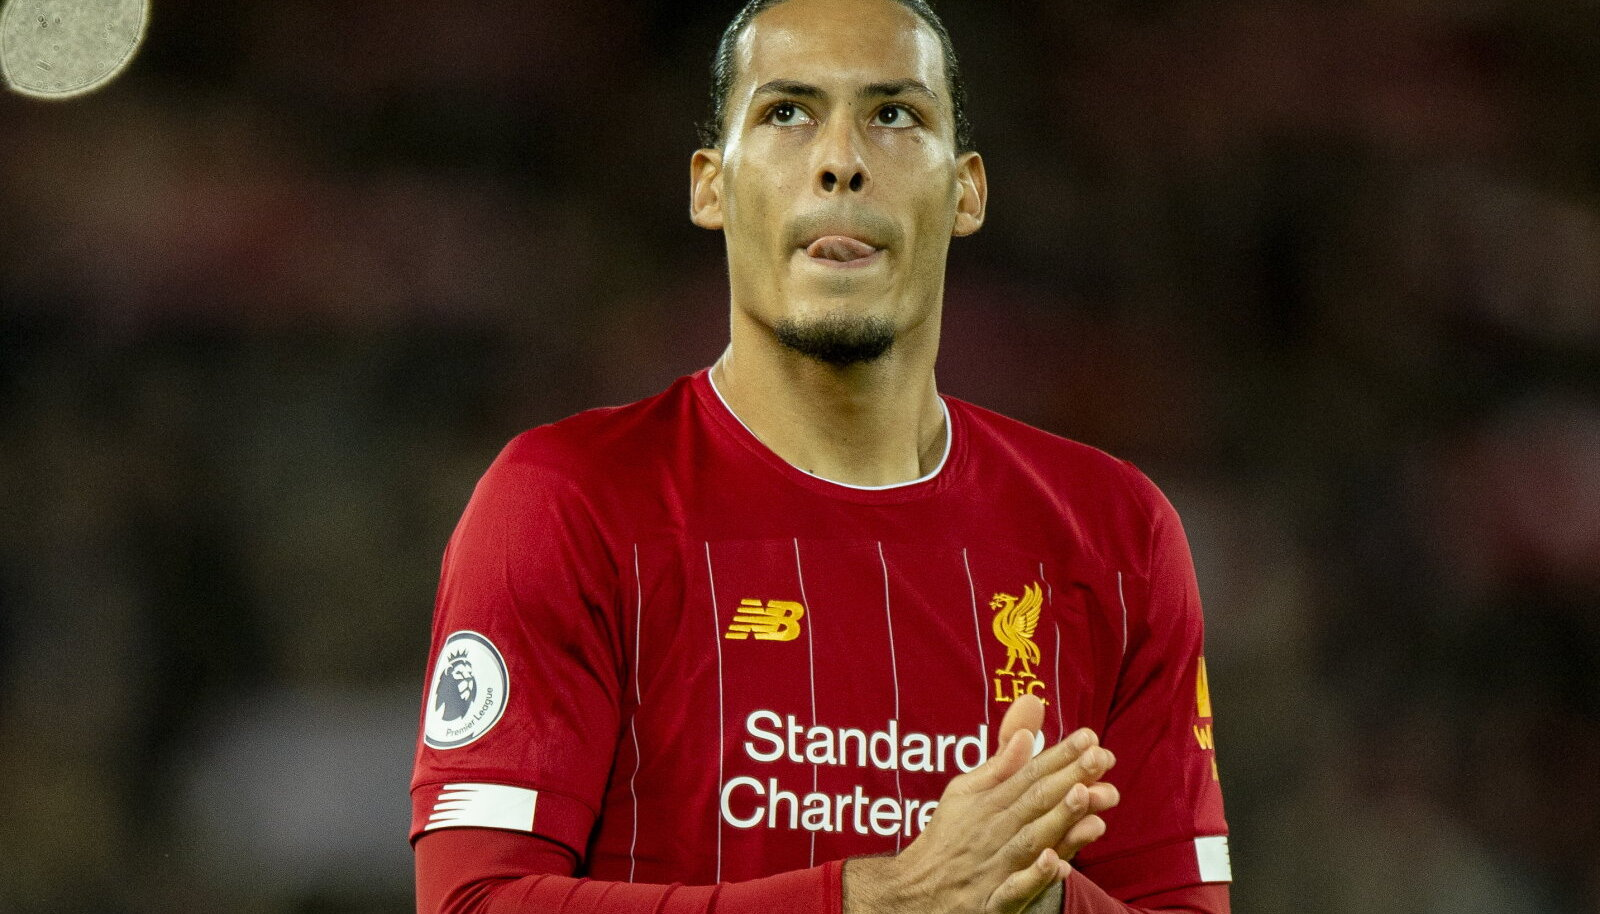 Liverpool FC üks liidritest Virgil van Dijk